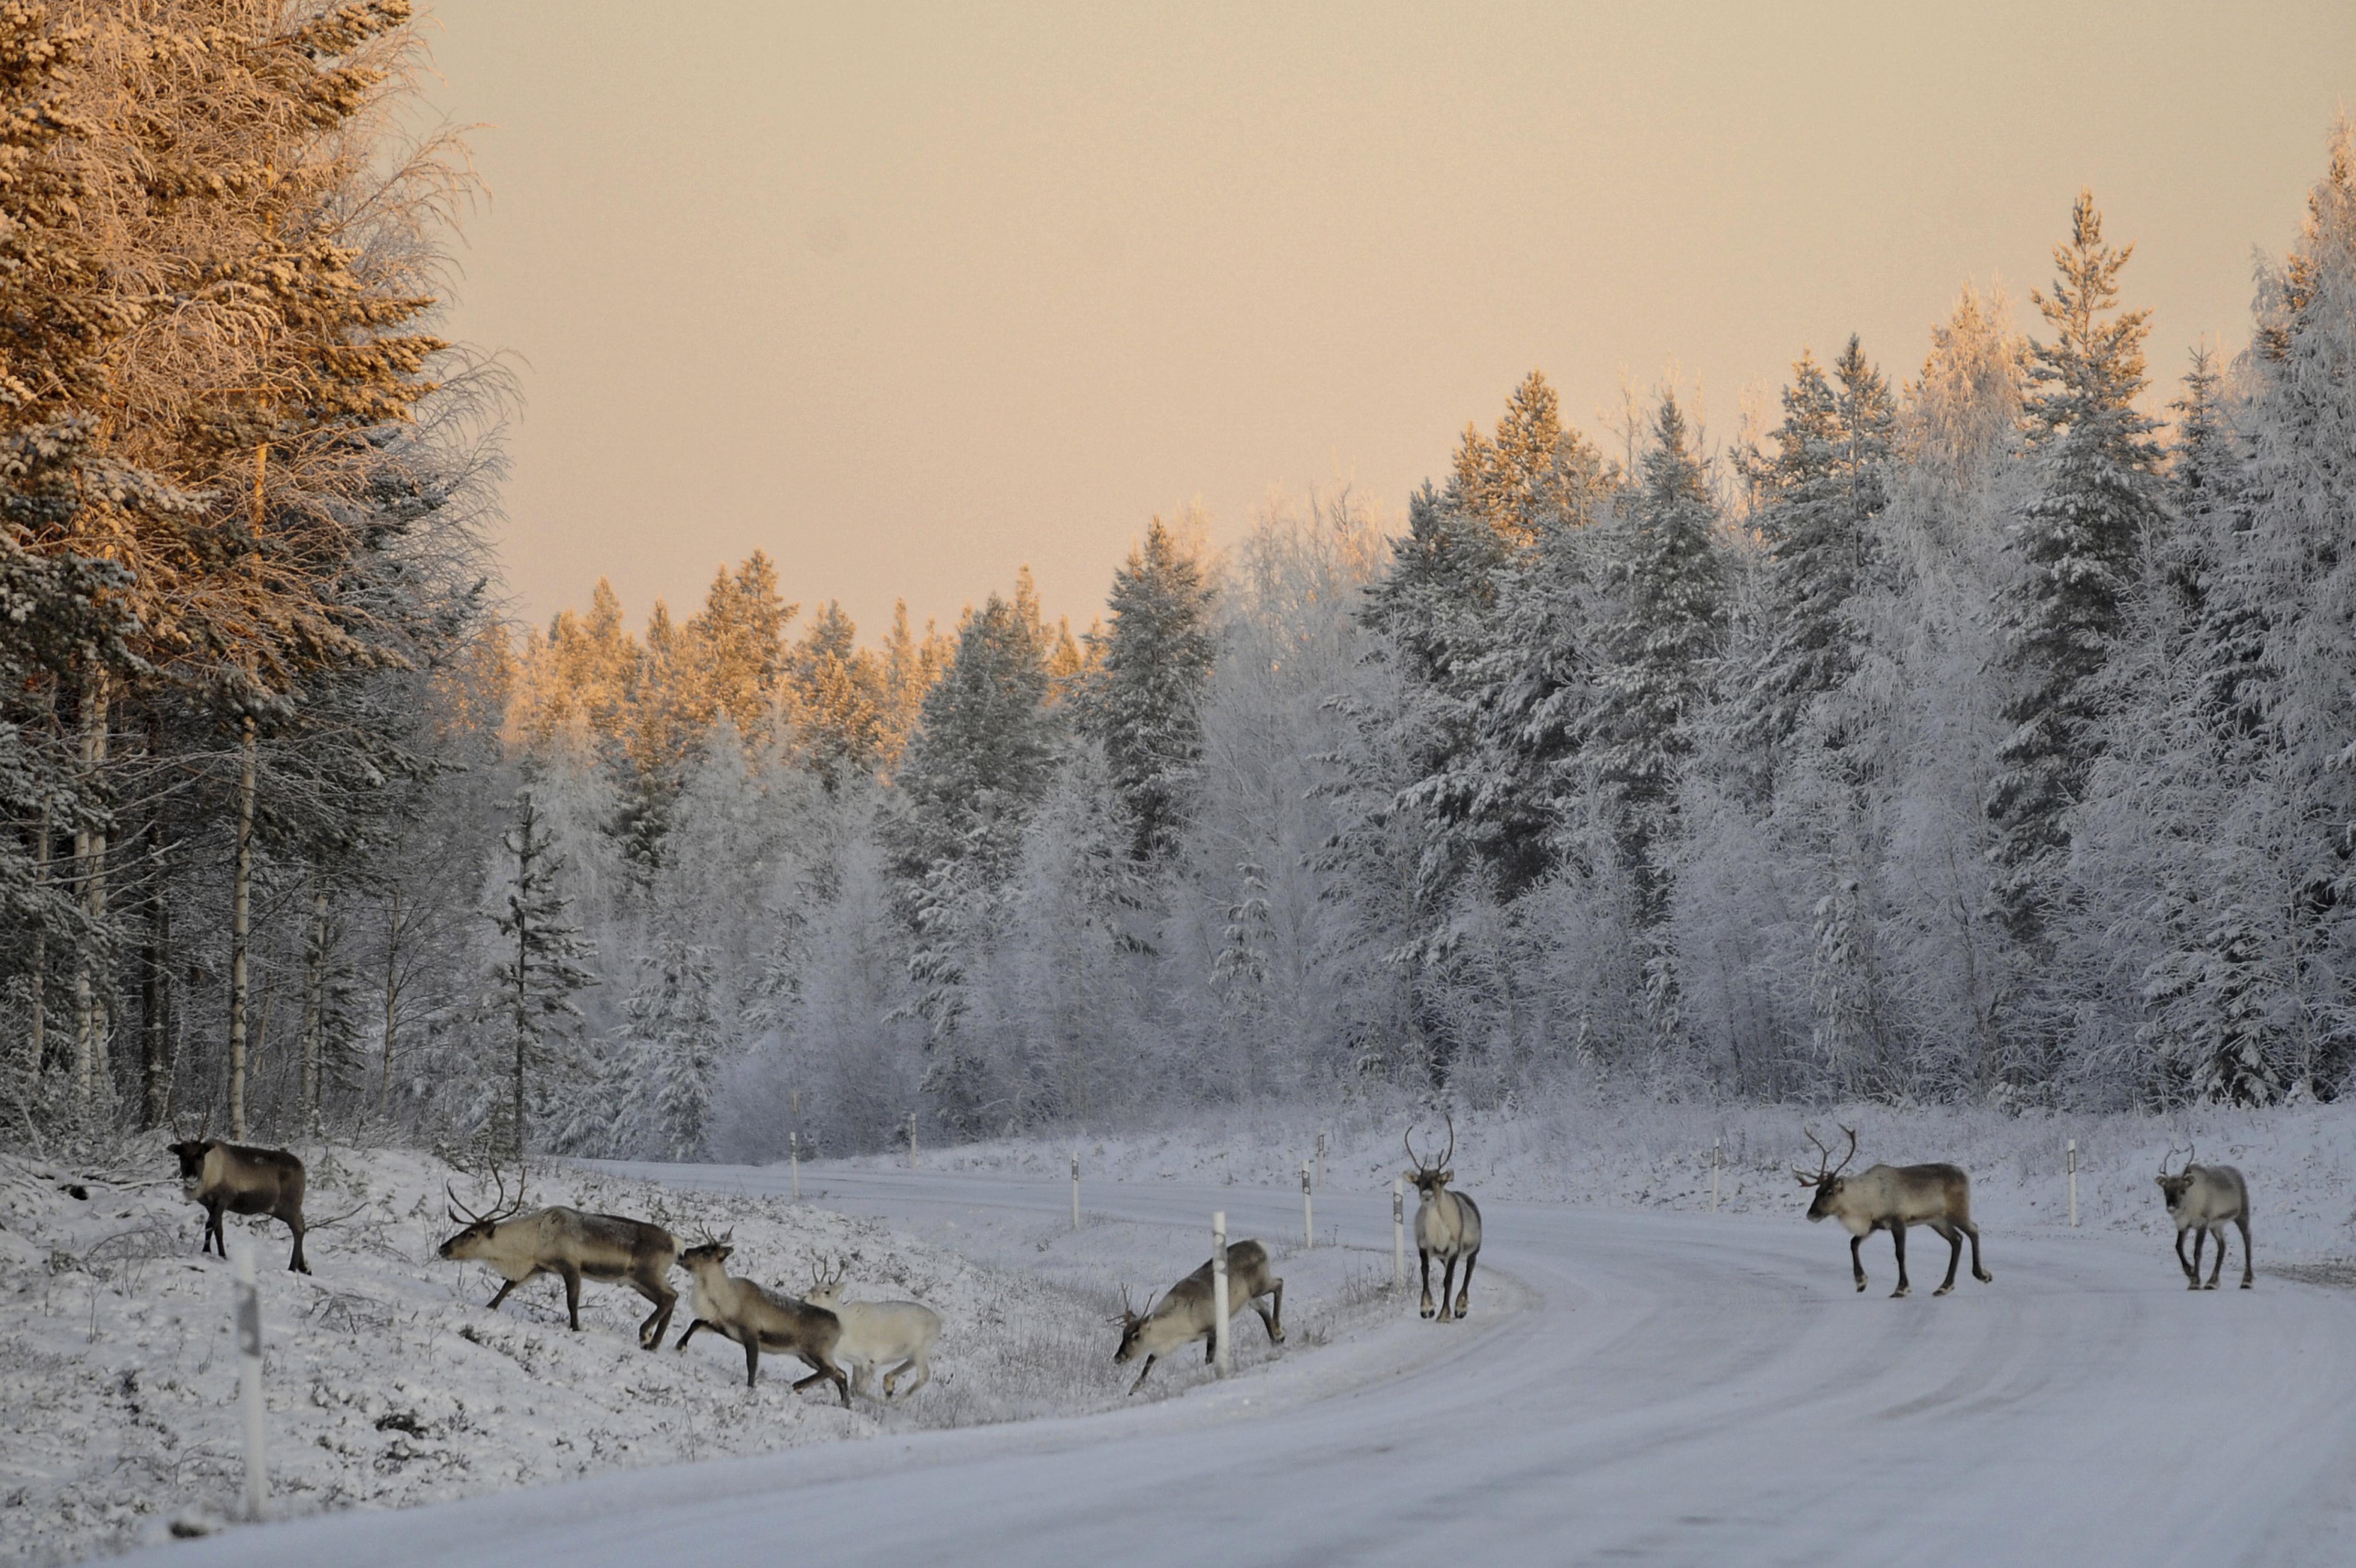 reindeer Lapland, Finland, 2008